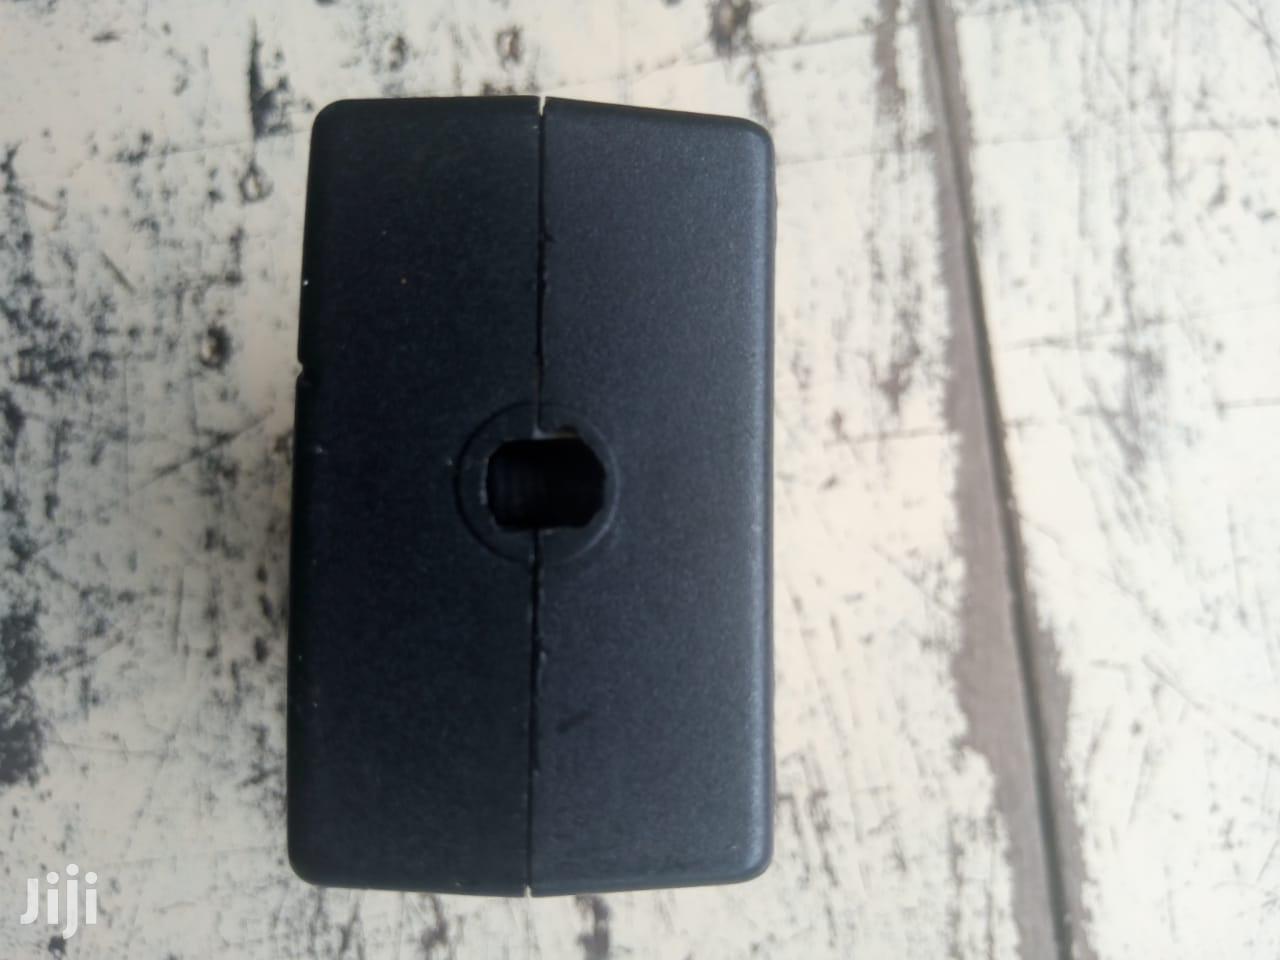 YAMAHA Keyboard Adaptors | Accessories & Supplies for Electronics for sale in Nairobi Central, Nairobi, Kenya